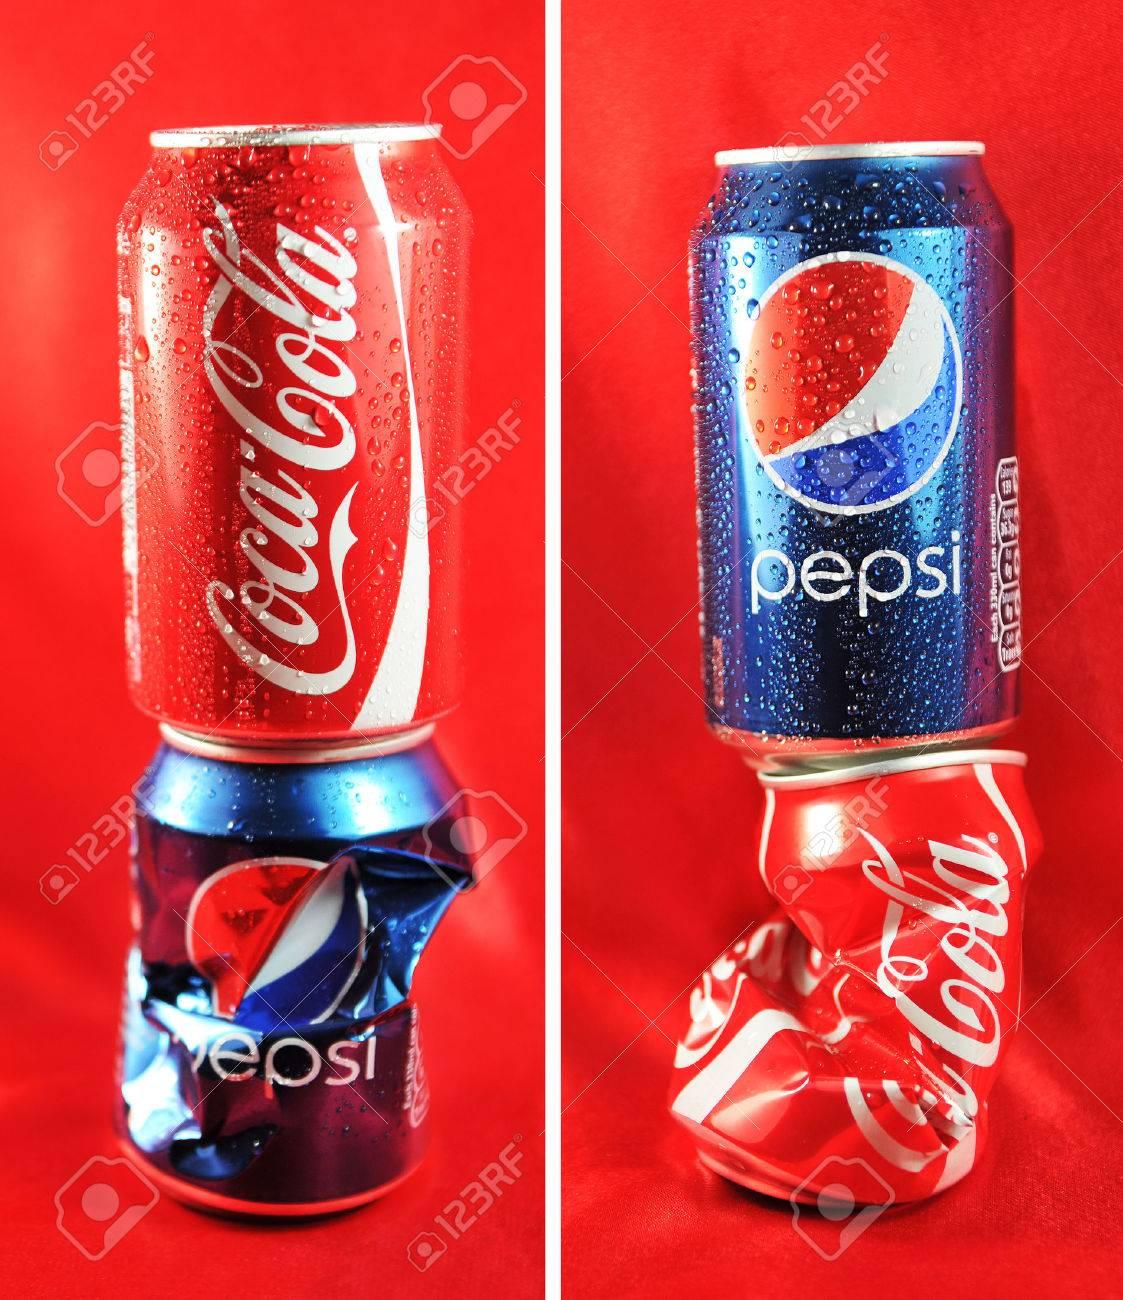 LONDON, UK - FEBRUARY 27, 2011: Coca Cola vs  Pepsi competition